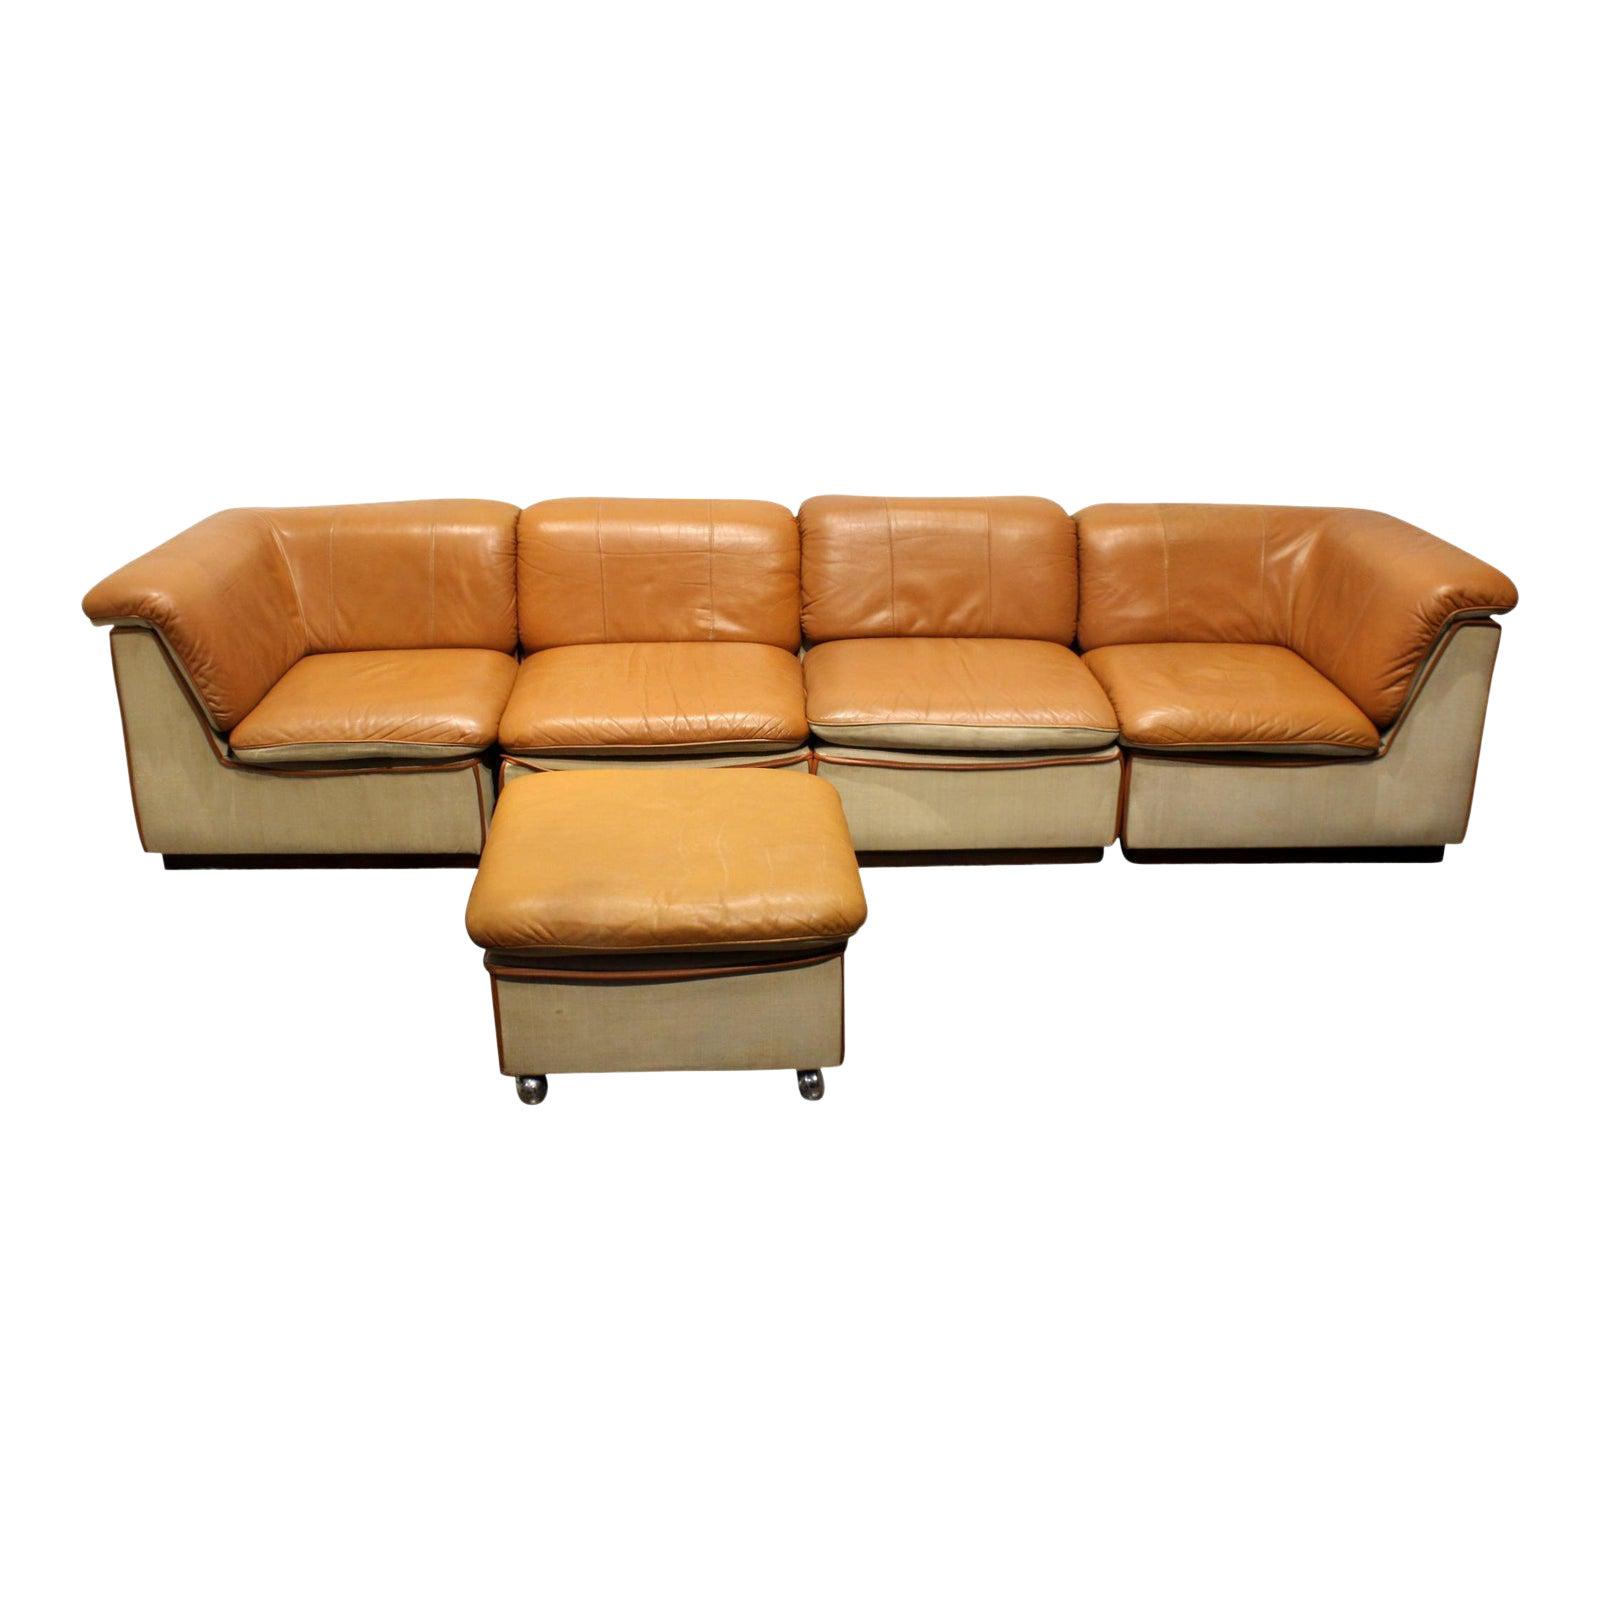 1960\'s Scandinavian Leather and Linen Modular Sectional Sofa